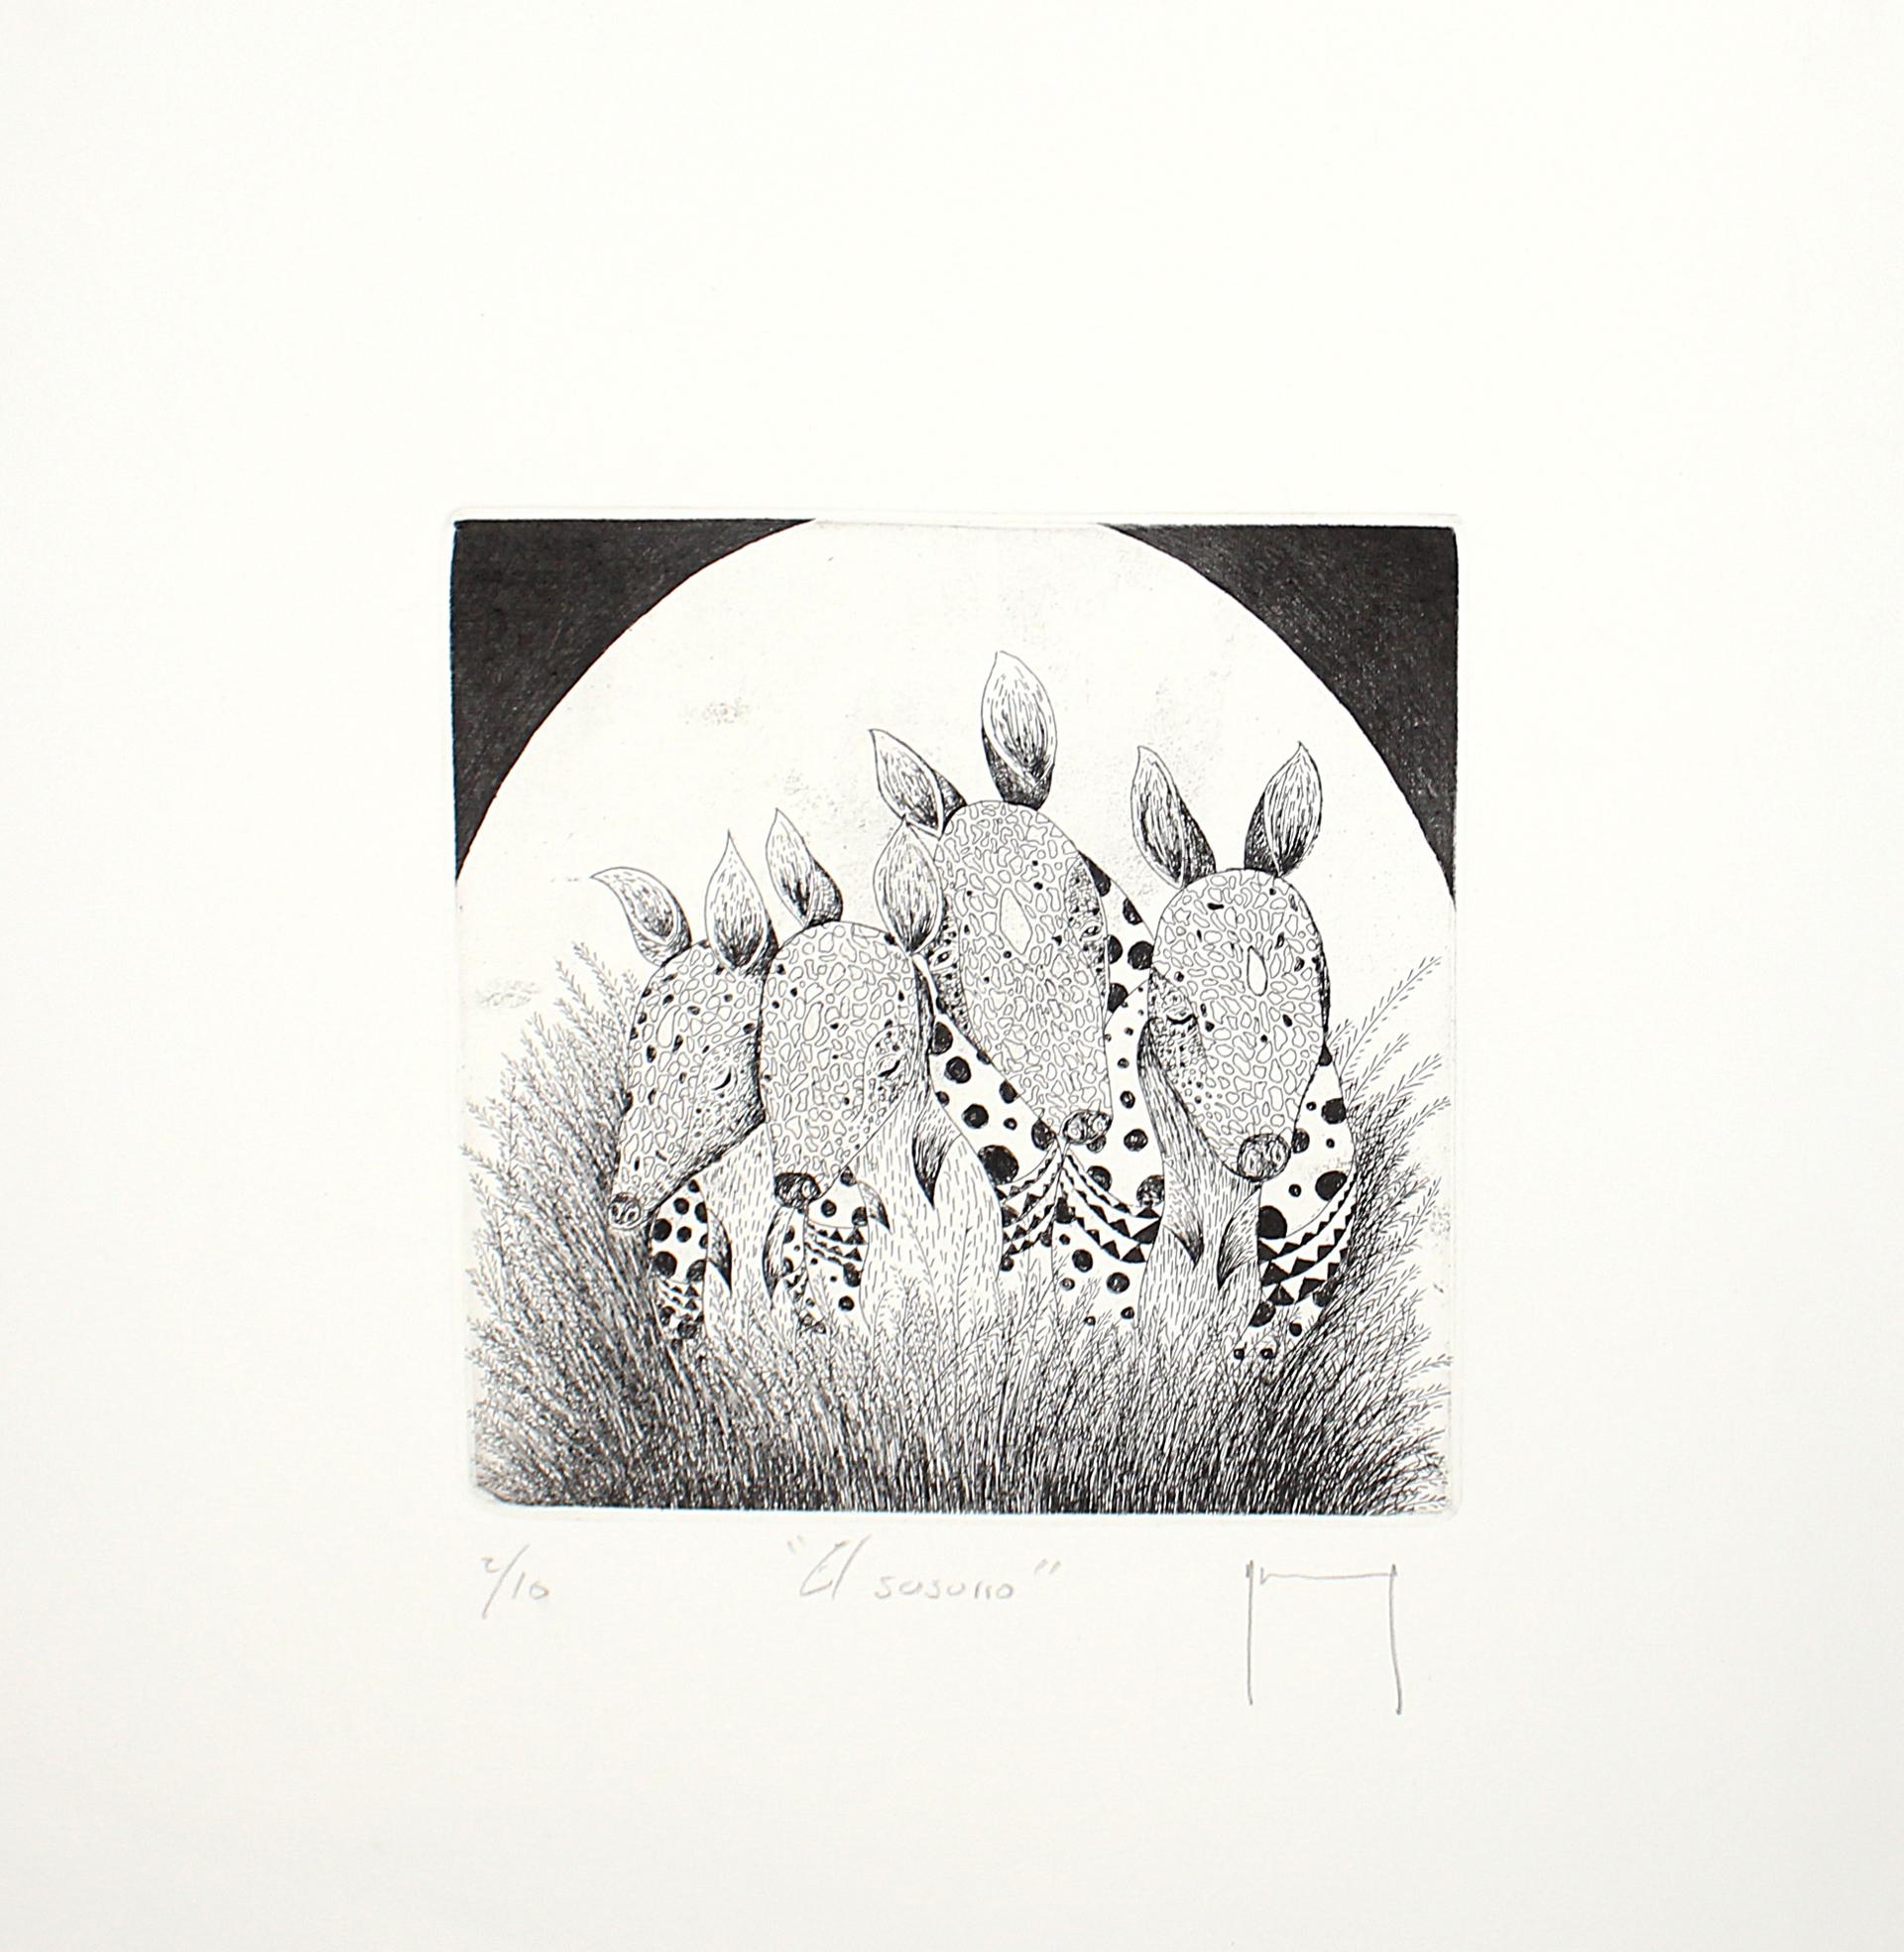 El Sosorro (Framed) by Miguel Jimenez Martinez